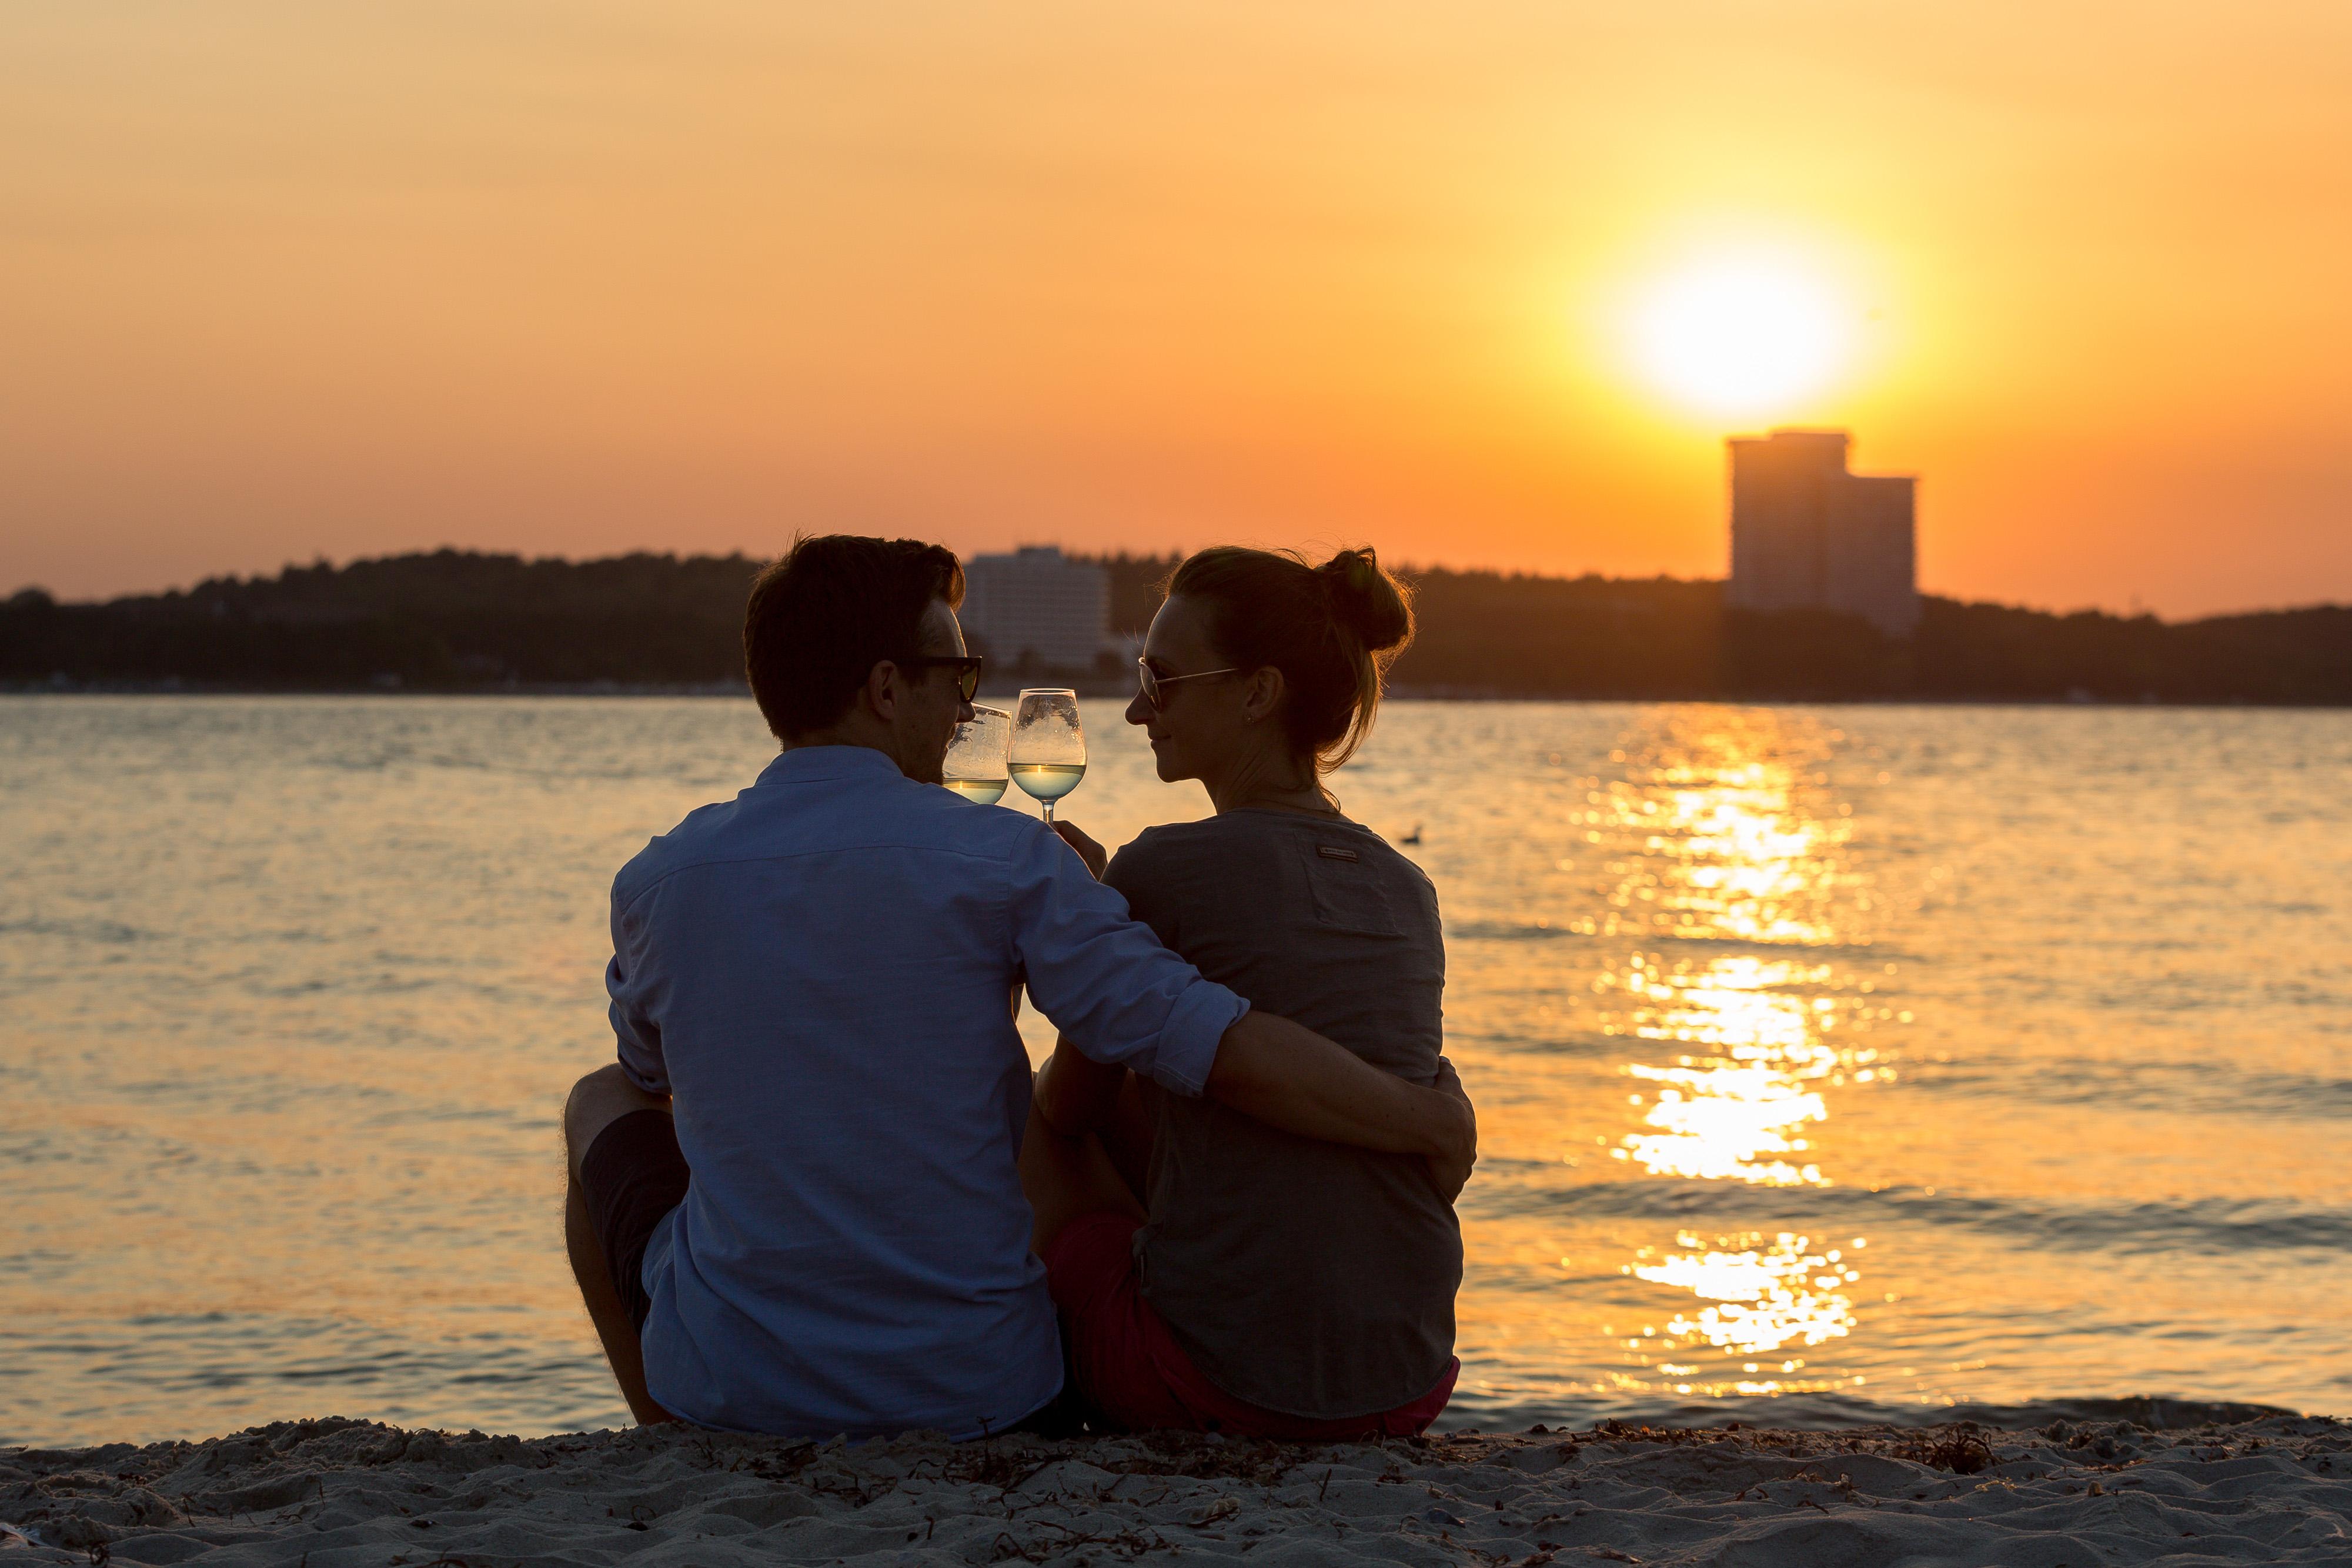 Romantik beim Sonnenuntergang am Strand